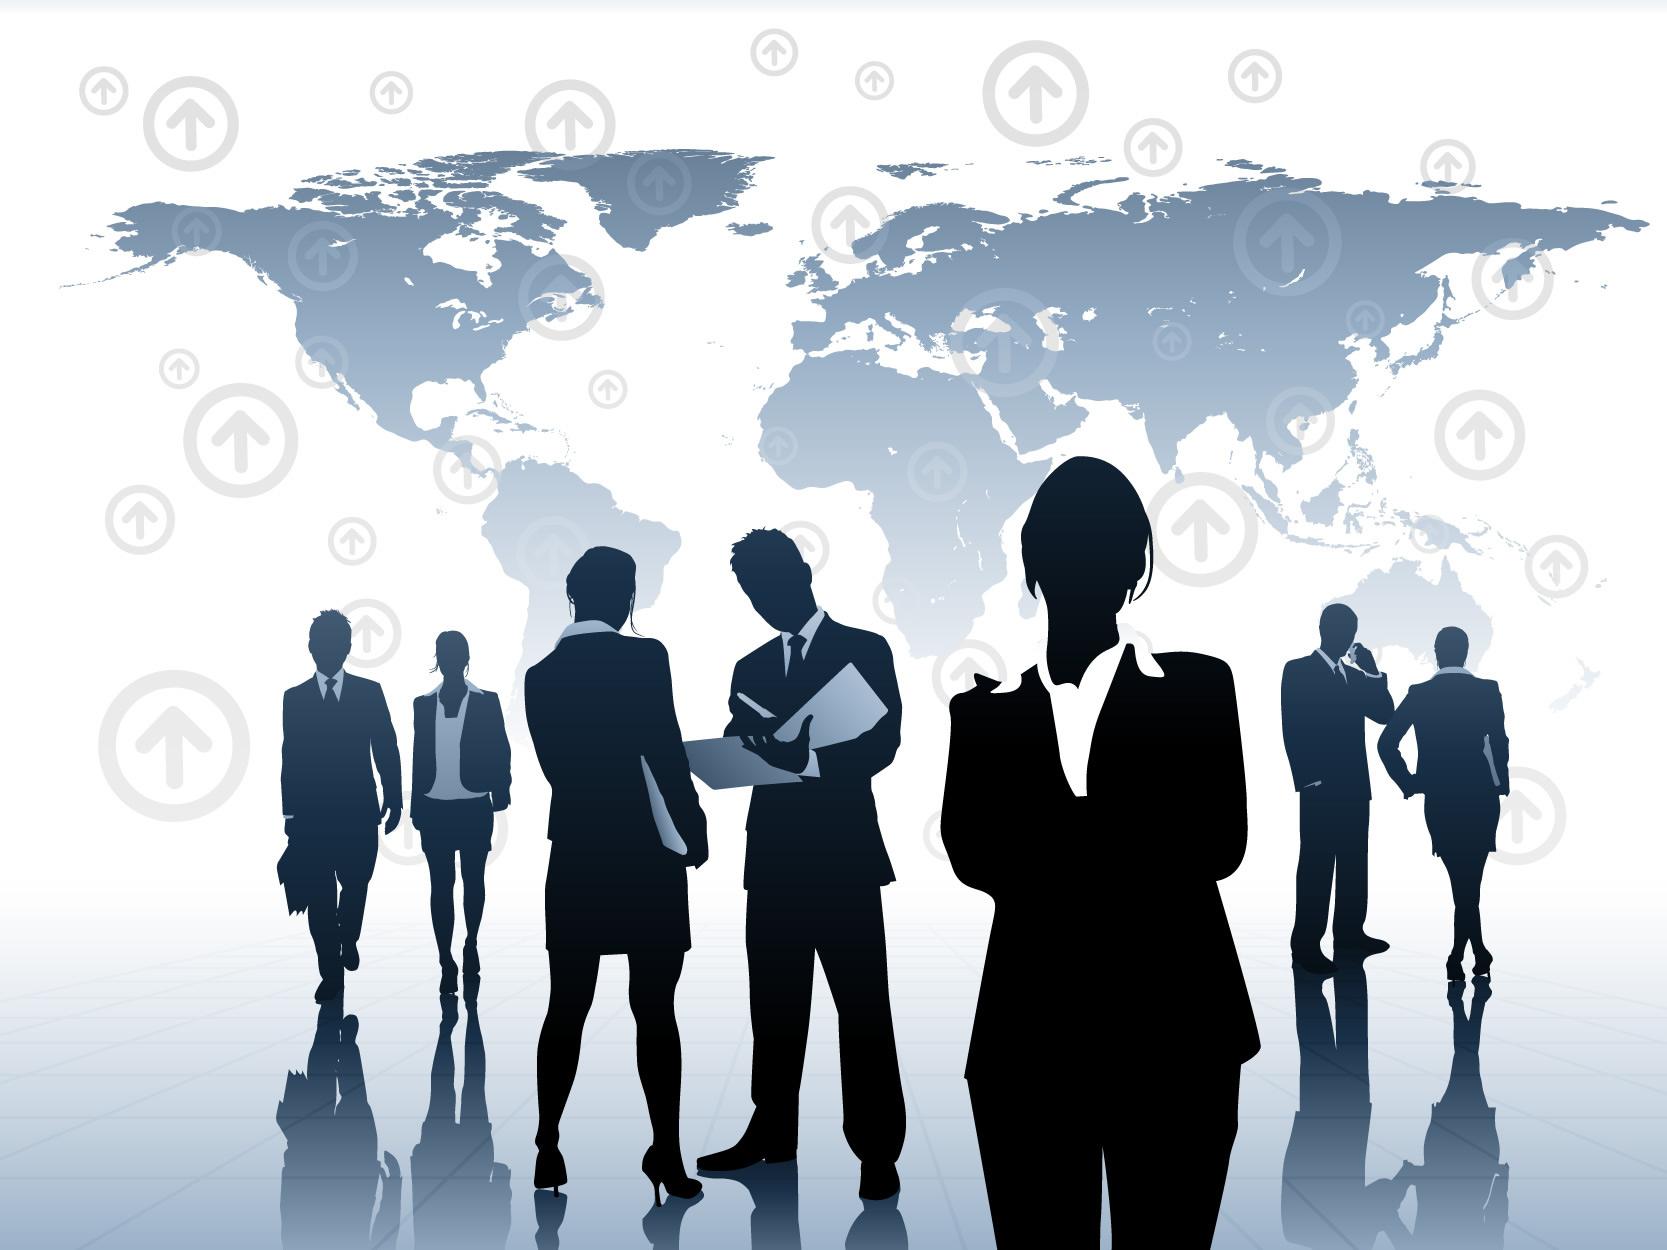 Summit_Brokerage_Services_Welcomes_New_Advisors.jpg.